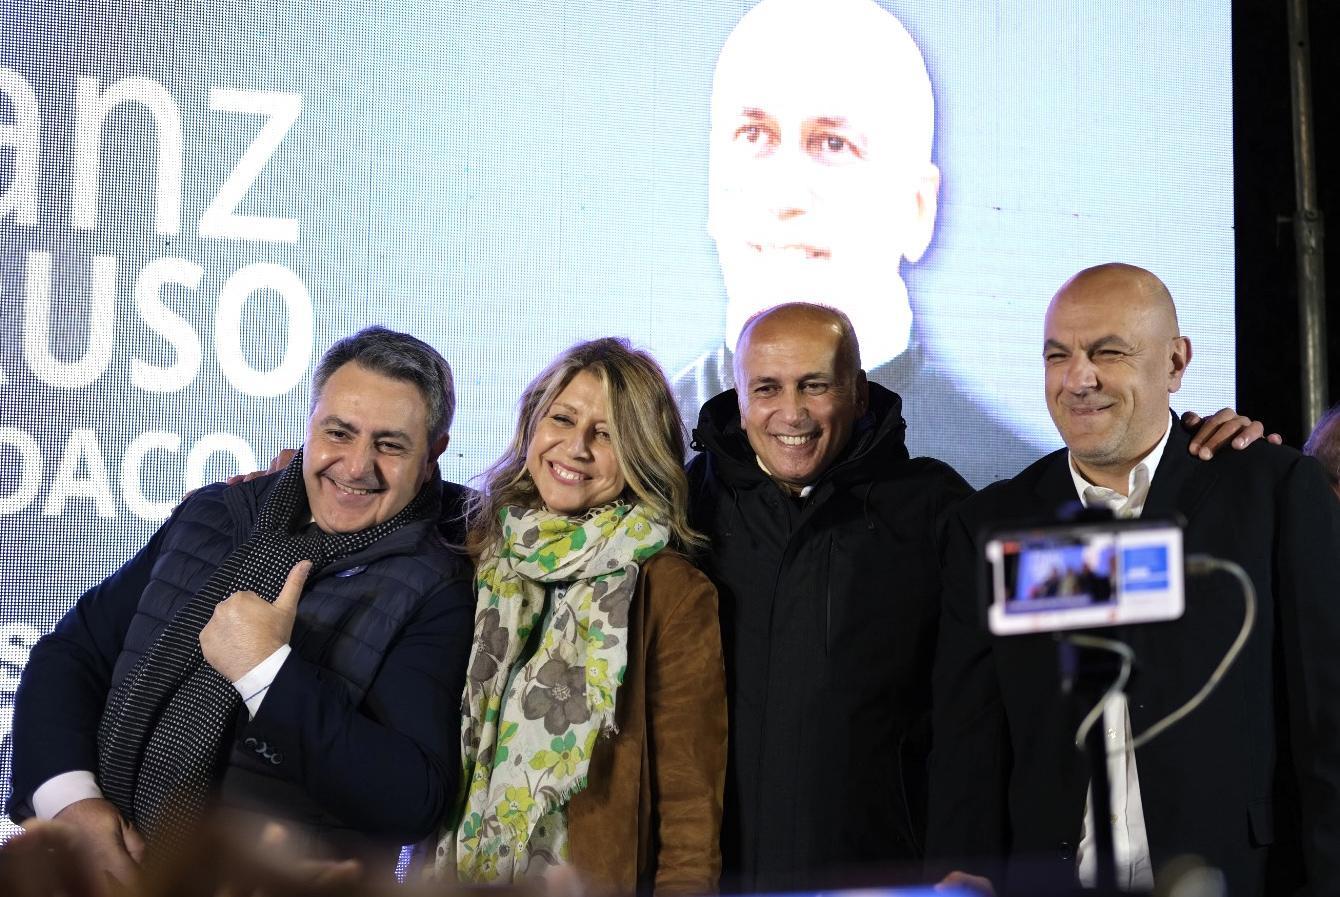 Da sx: Fabio Gallo, Bianca Rende, Franz Caruso, Francesco De Cicco